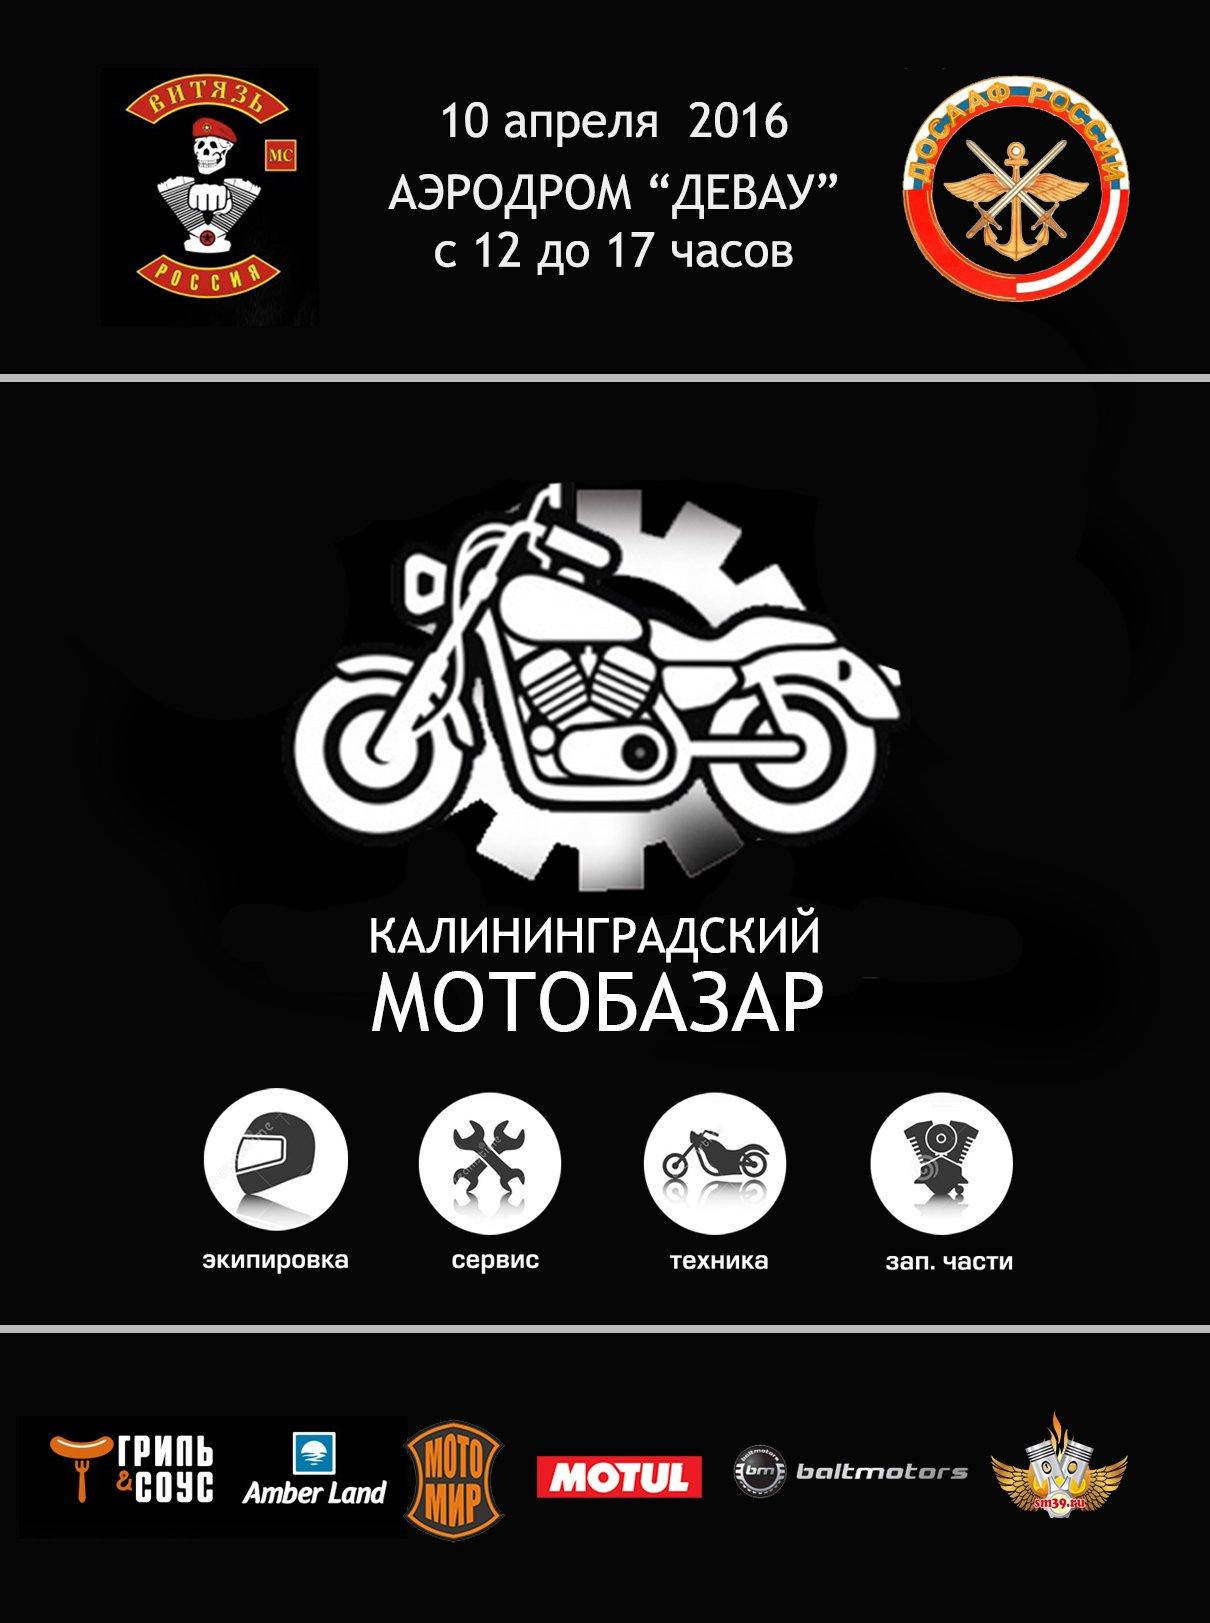 """I - Калининградский мотобазар"", 10 апреля 2016"